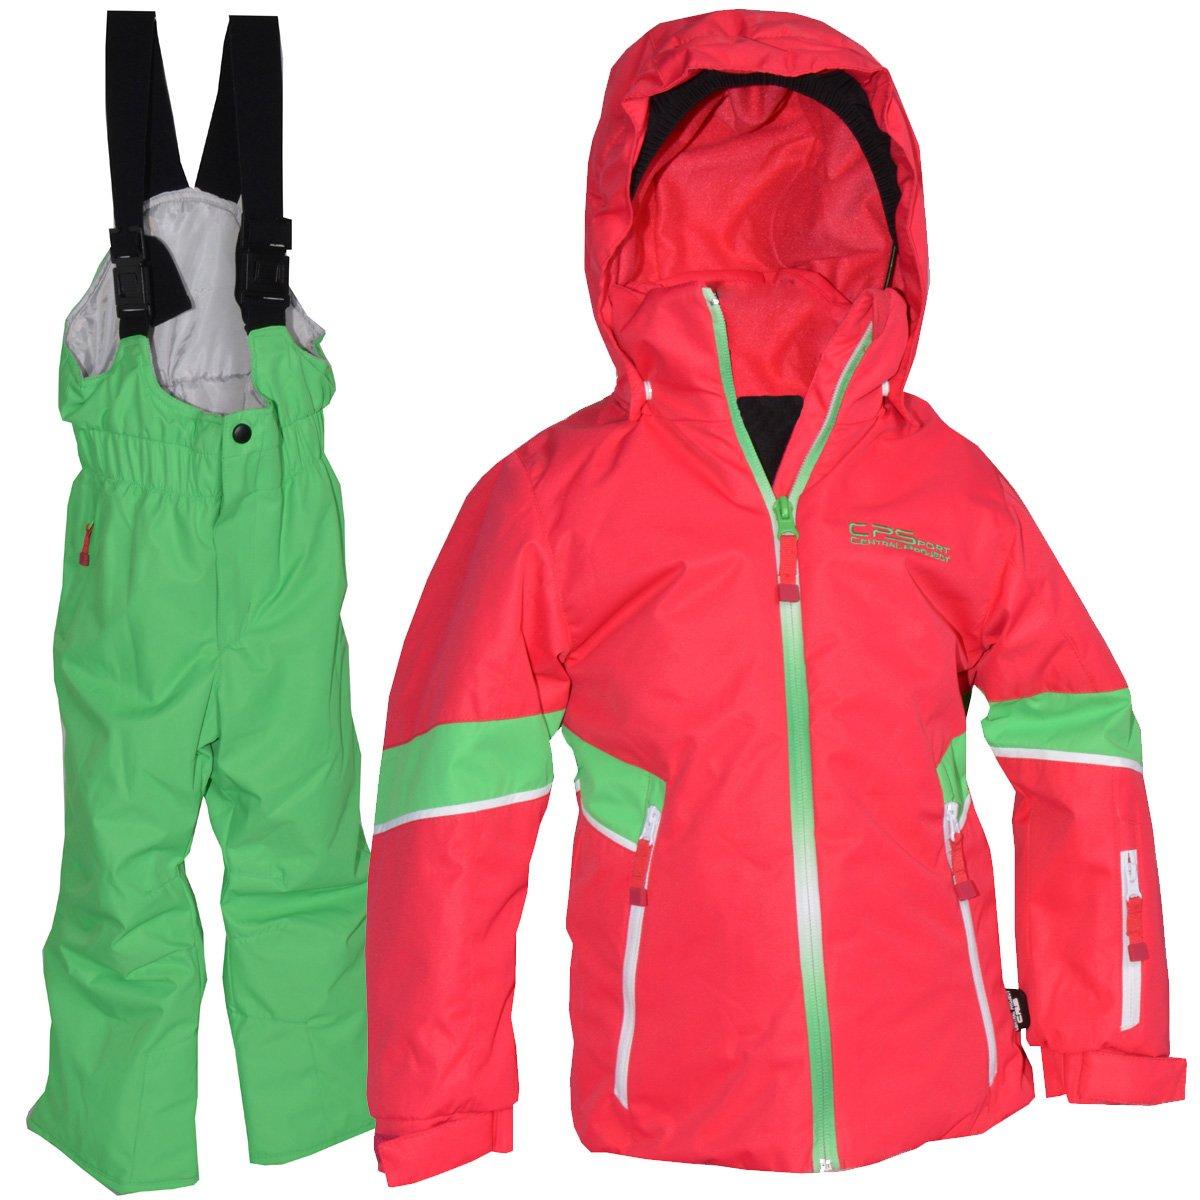 Central Project Baby Ski Anzug Cloe